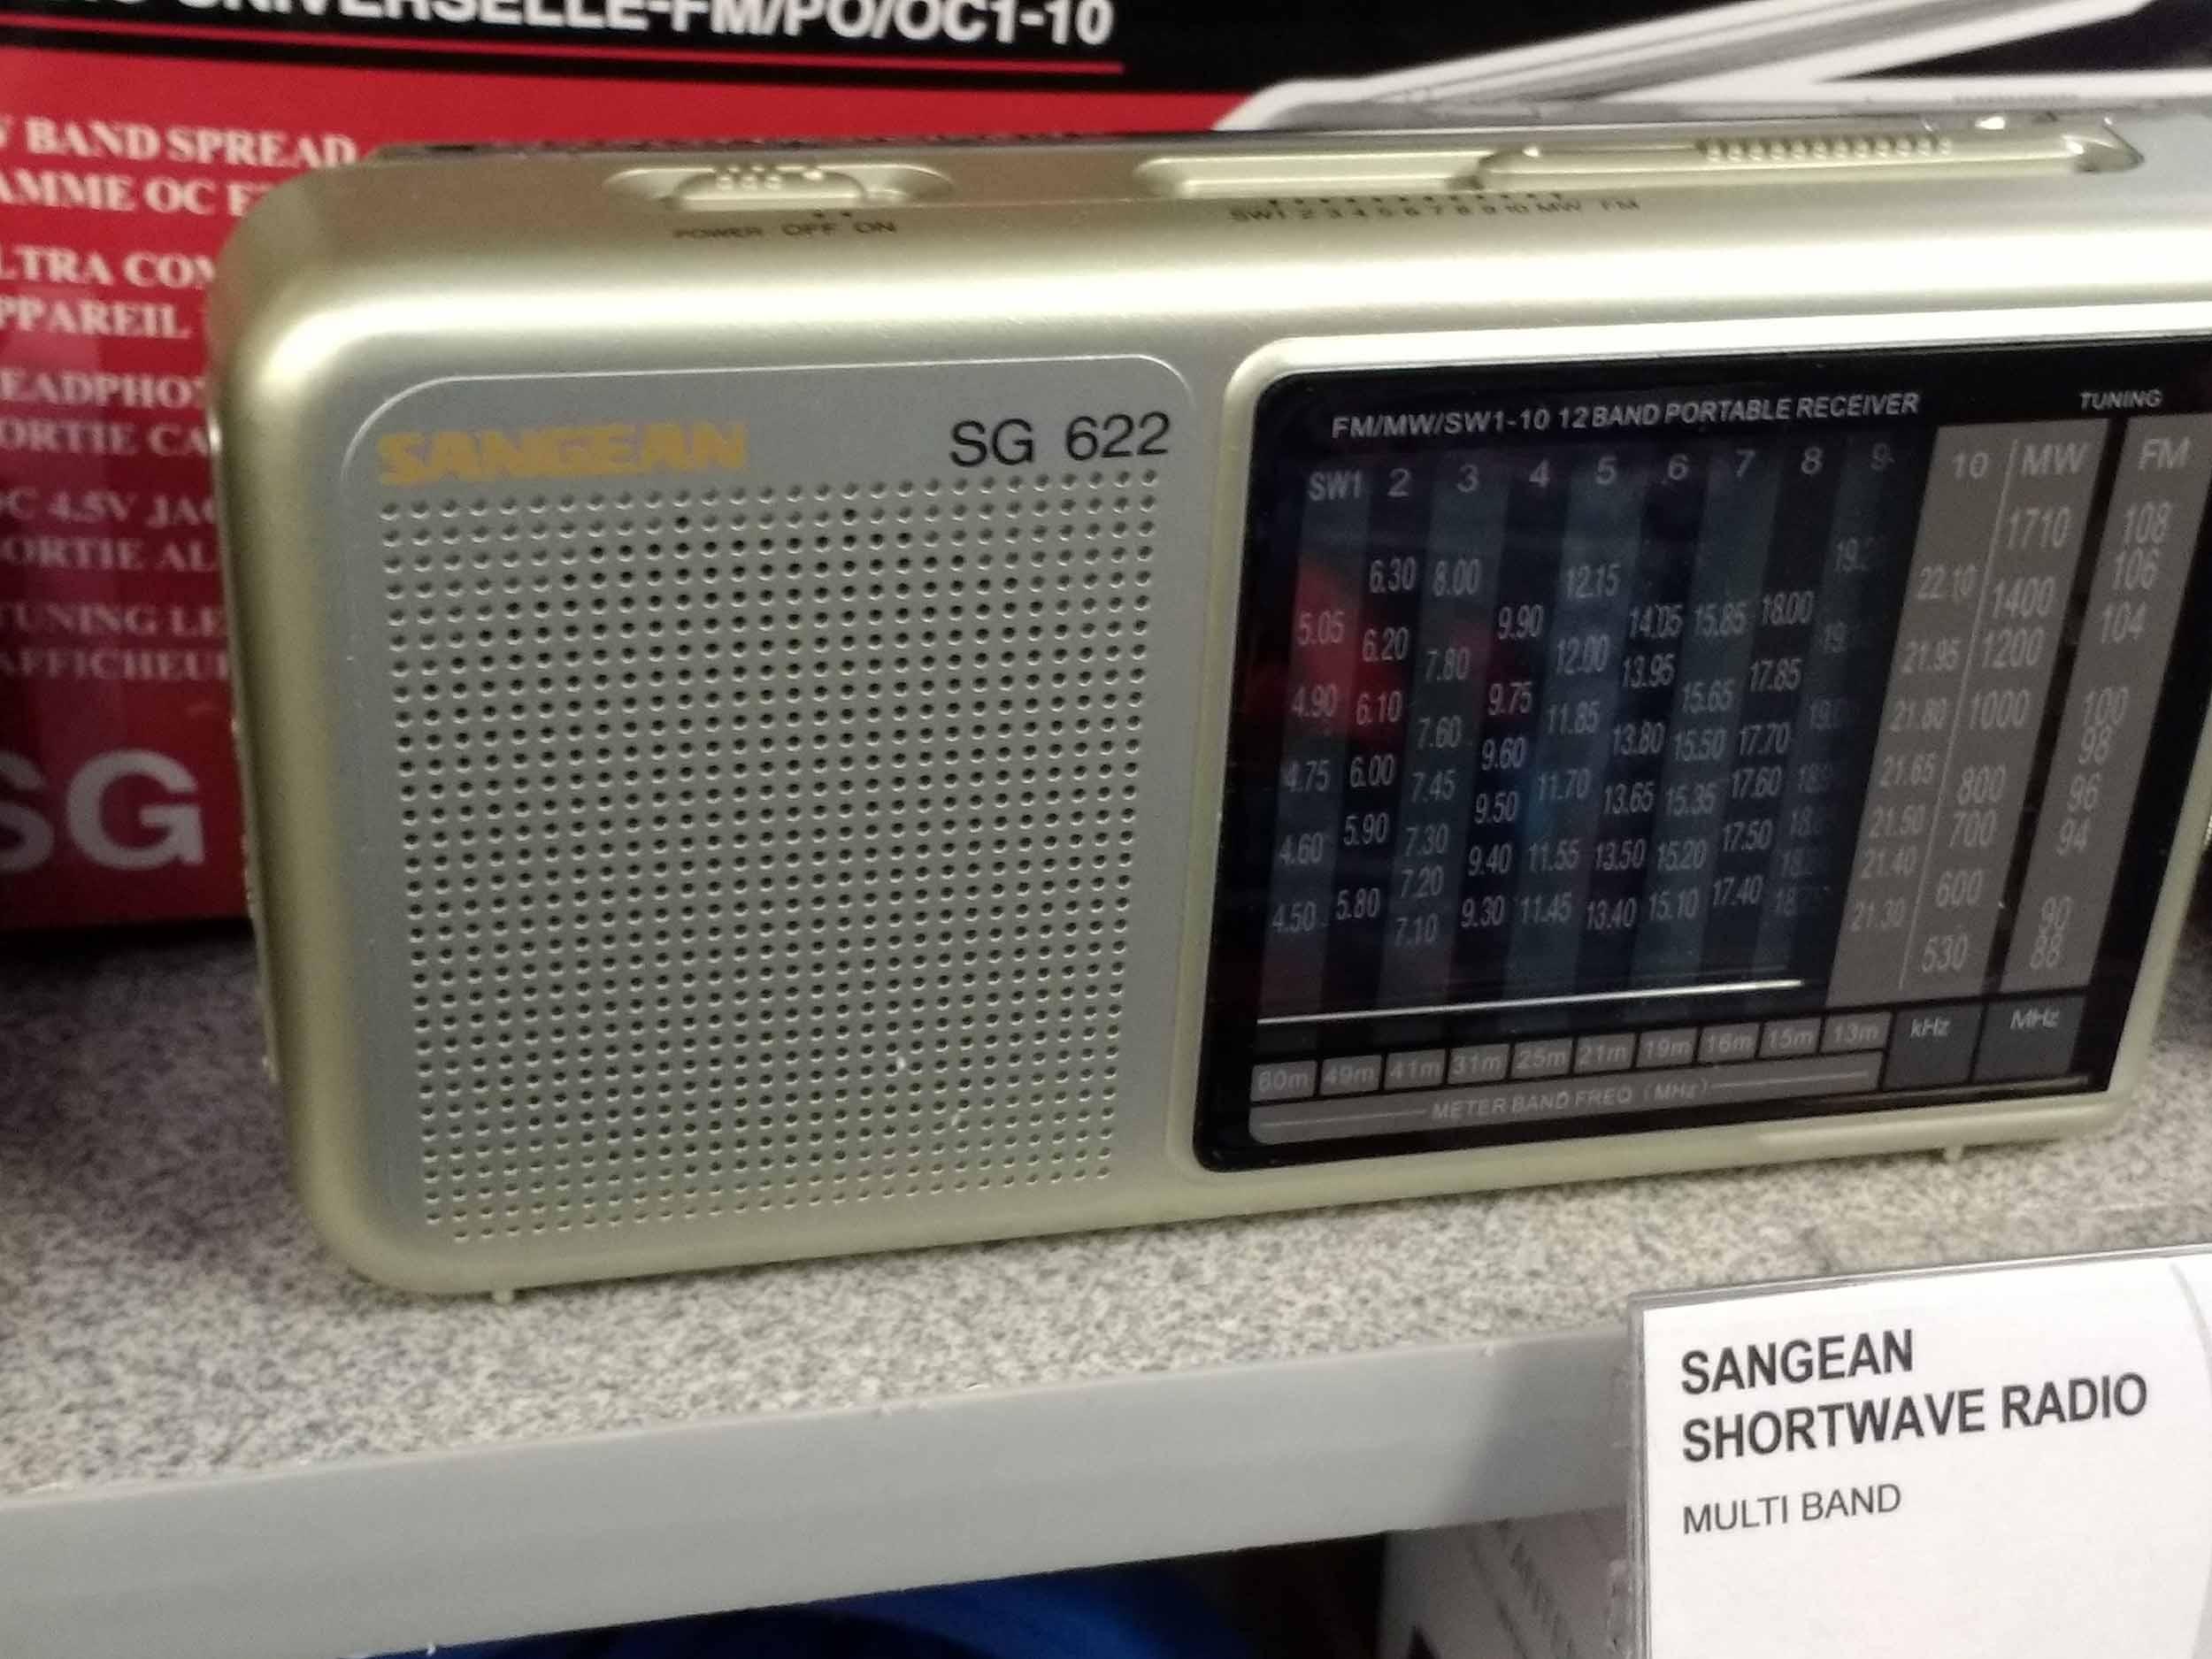 We have shortwave radios for international broadcasts